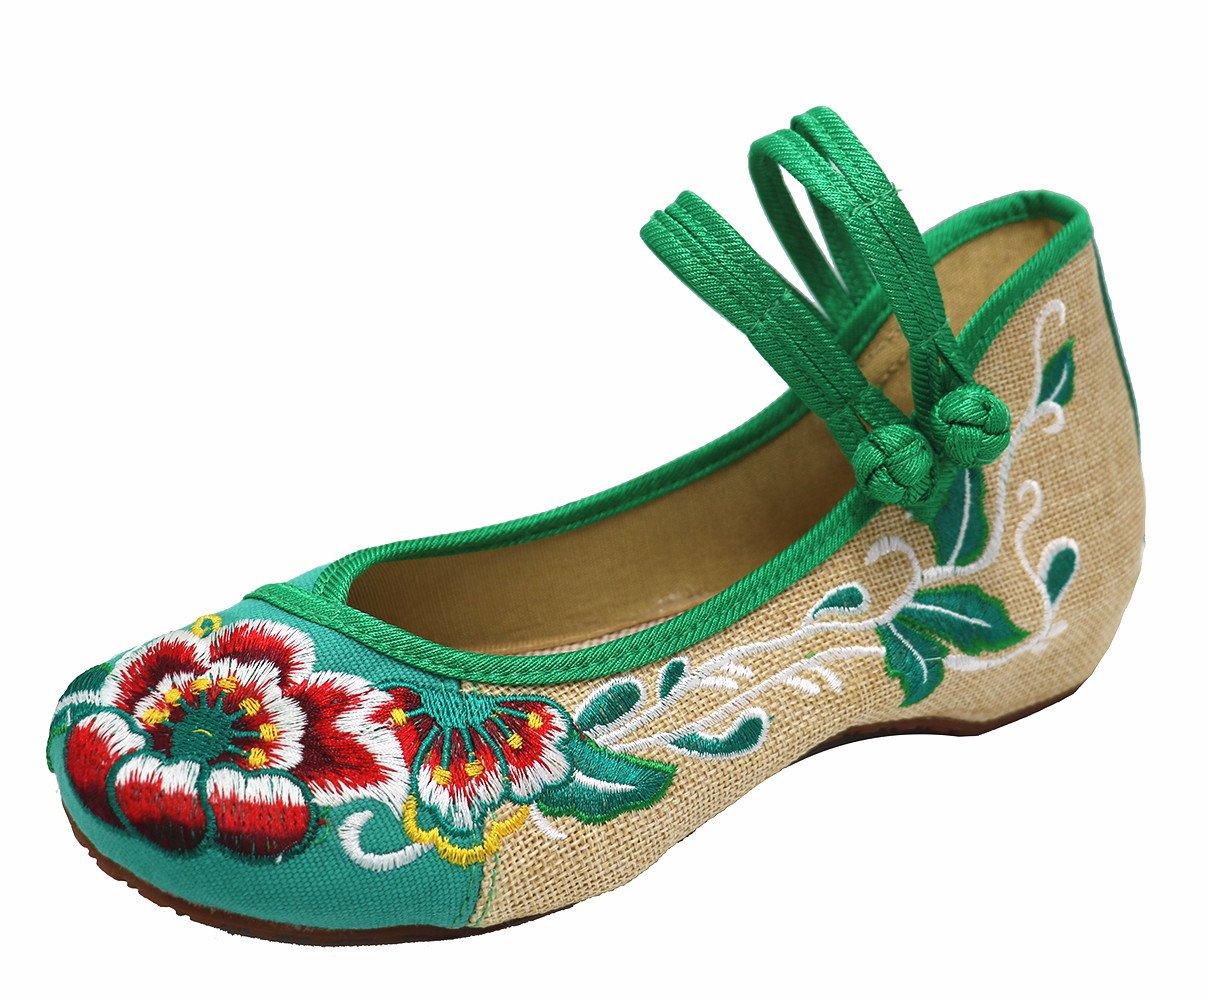 ICEGREY Main Mary Slip On Chaussures Femmes Fait Main Chaussures Broderie Fleur Deux Bracelet Basse Wedge Mary Jane Chaussures Vert 6a805b7 - piero.space